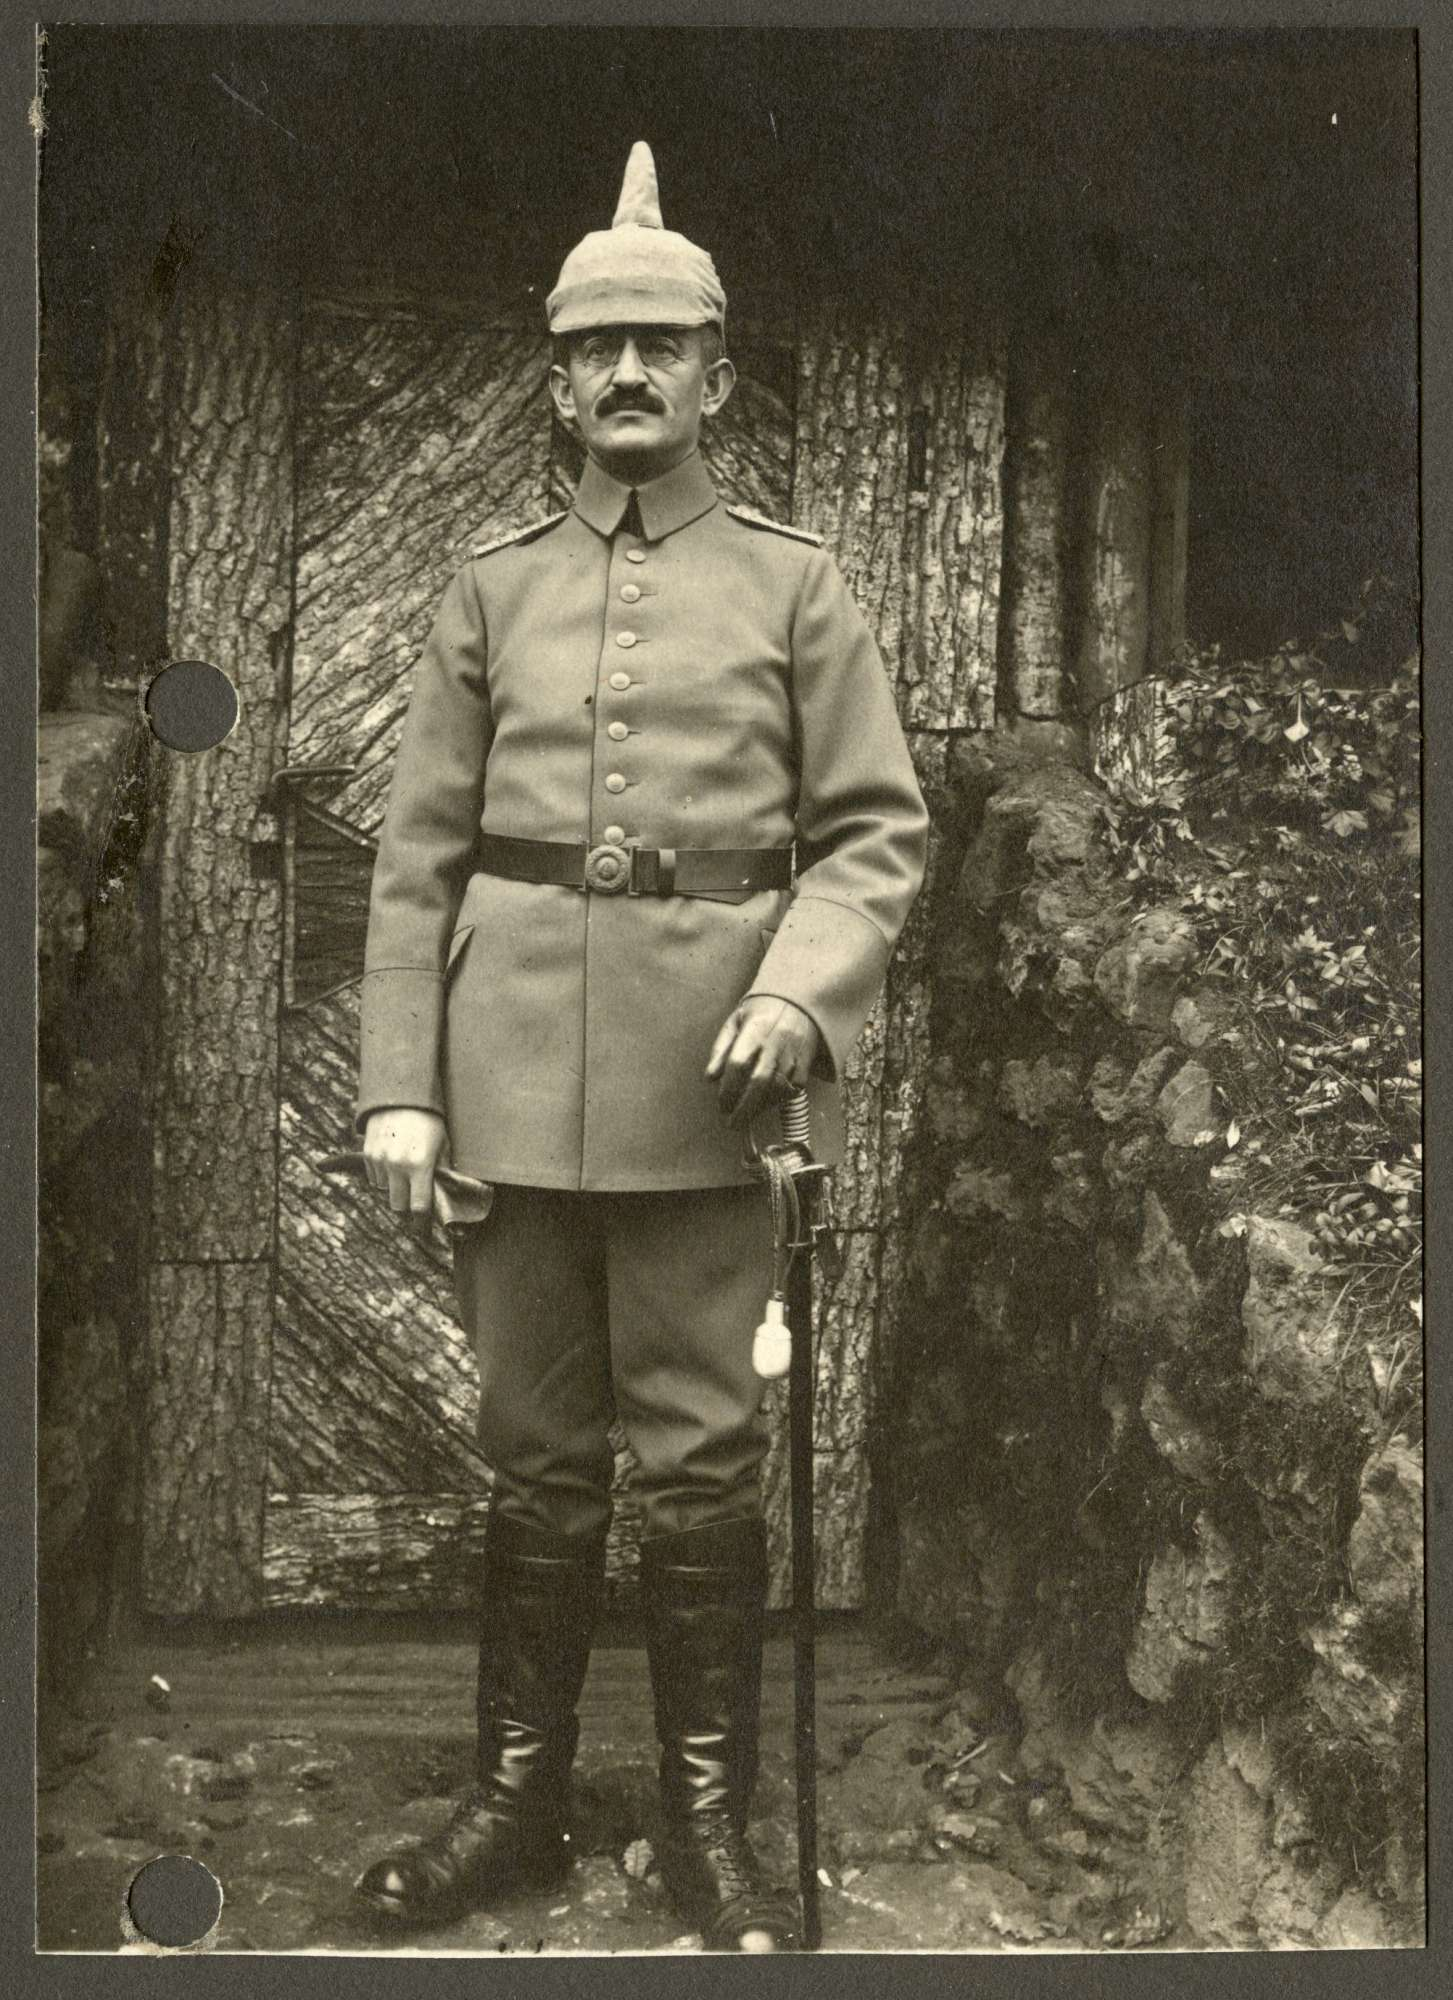 Zürn, Konrad, Bild 1